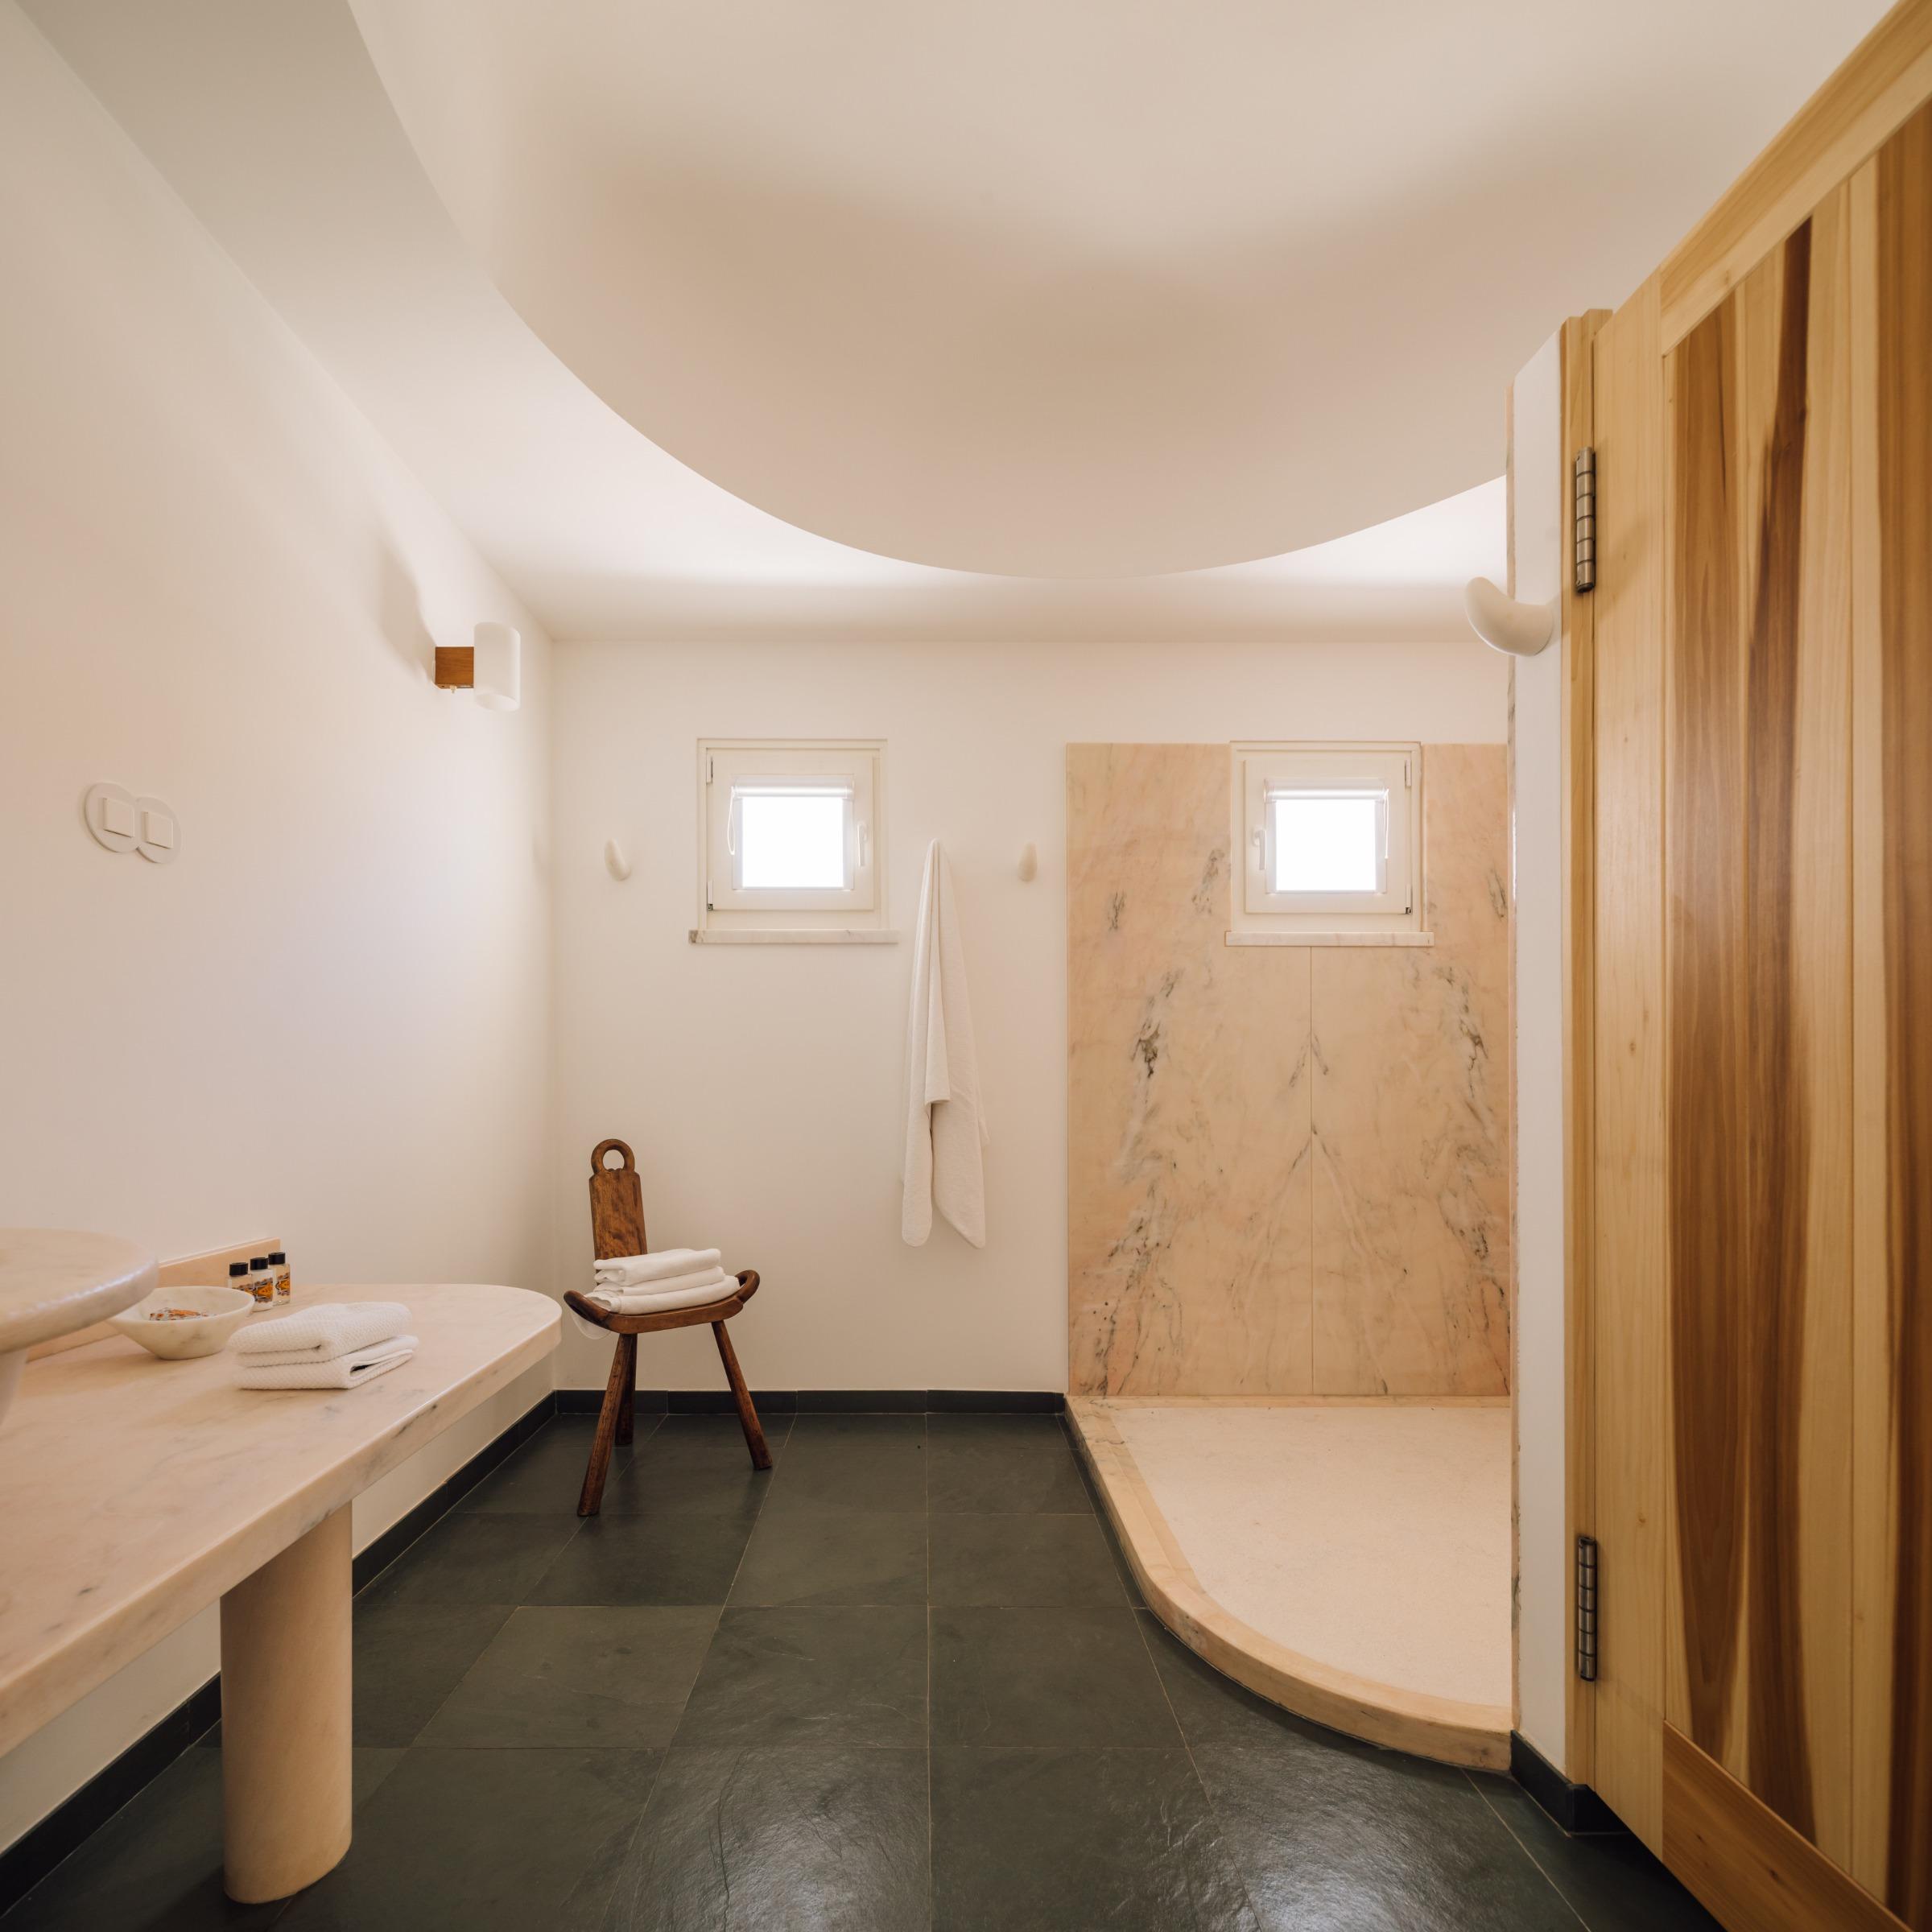 Dalicenca pt stay suite mypool 8